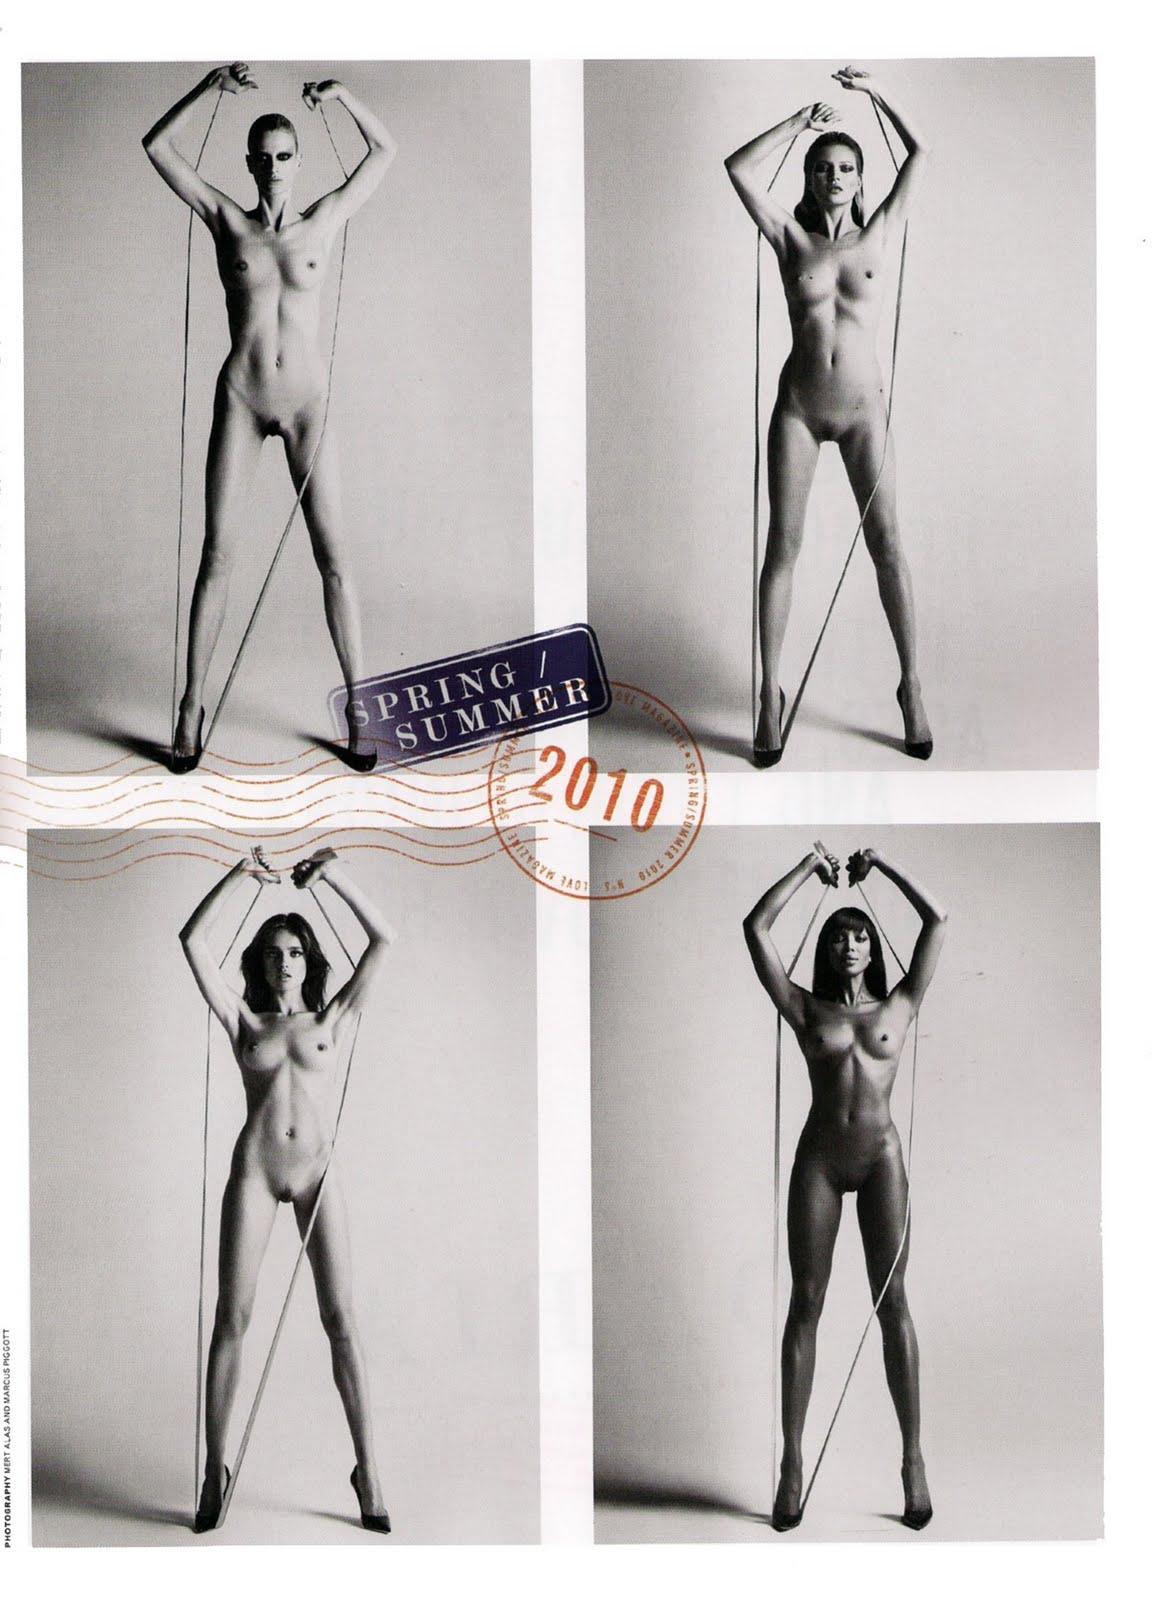 http://1.bp.blogspot.com/_Obsfun0tZDU/S3FAsaSE9mI/AAAAAAAAOrM/HOr17S5ZOsU/s1600/love-nude-02.jpg